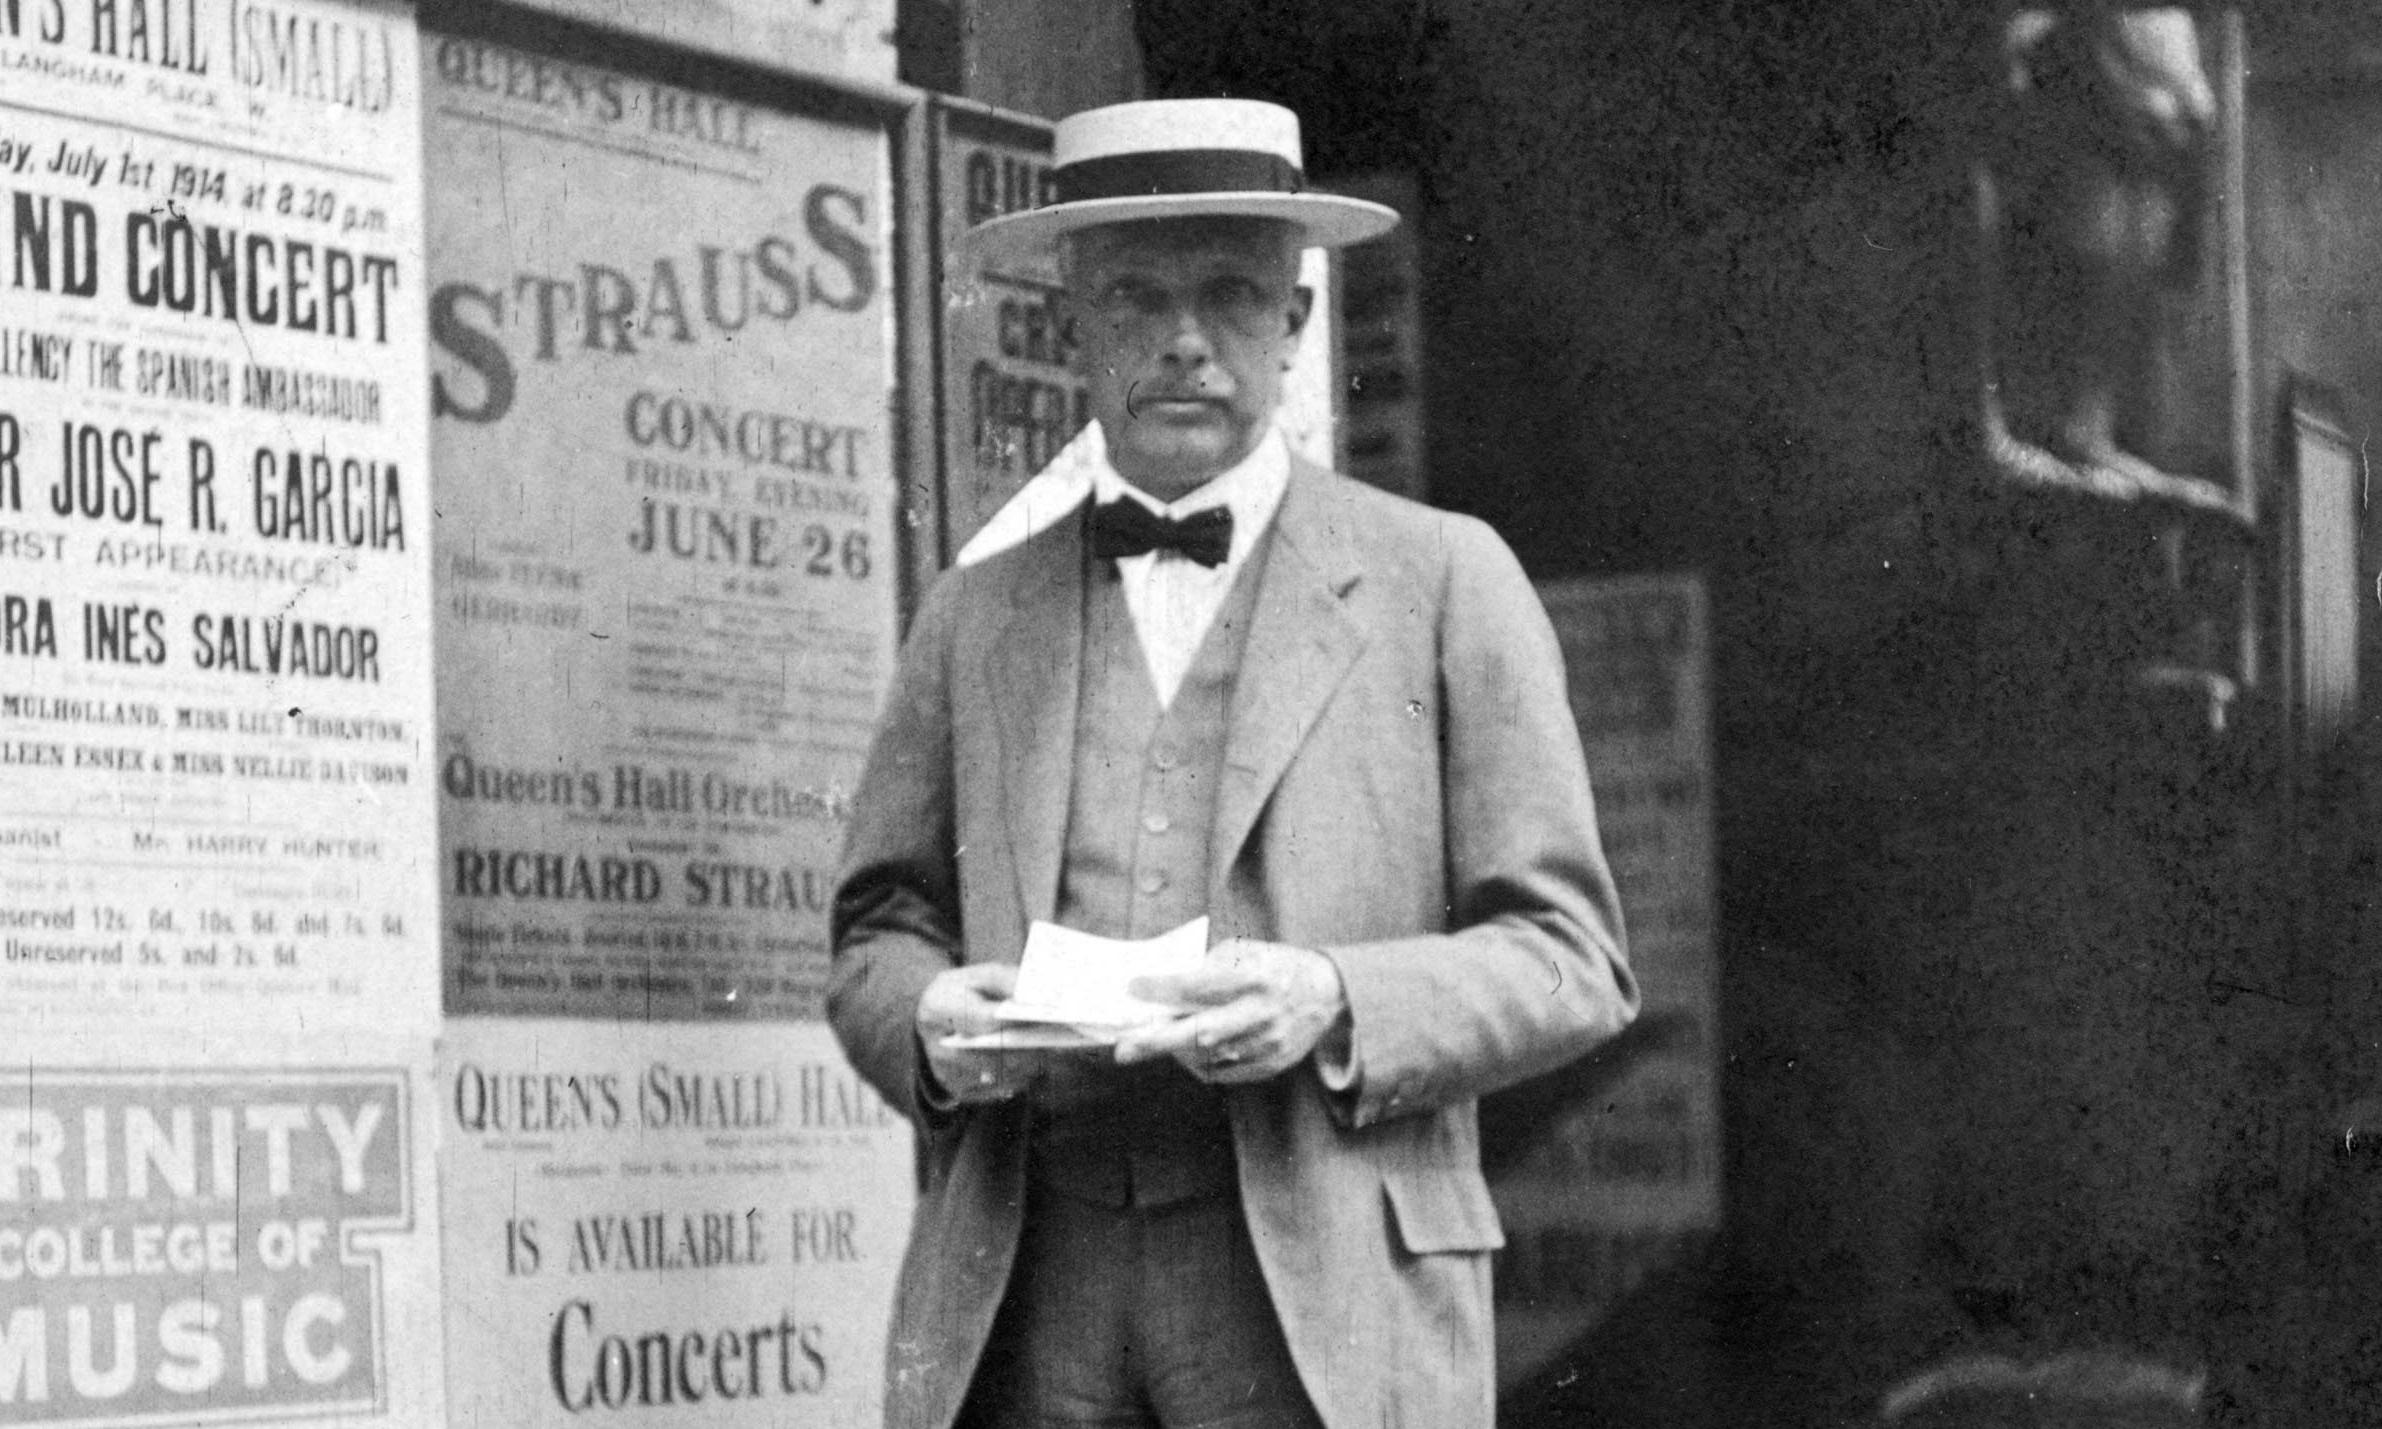 London festival celebrates the music of Richard Strauss – archive, 11 June 1903